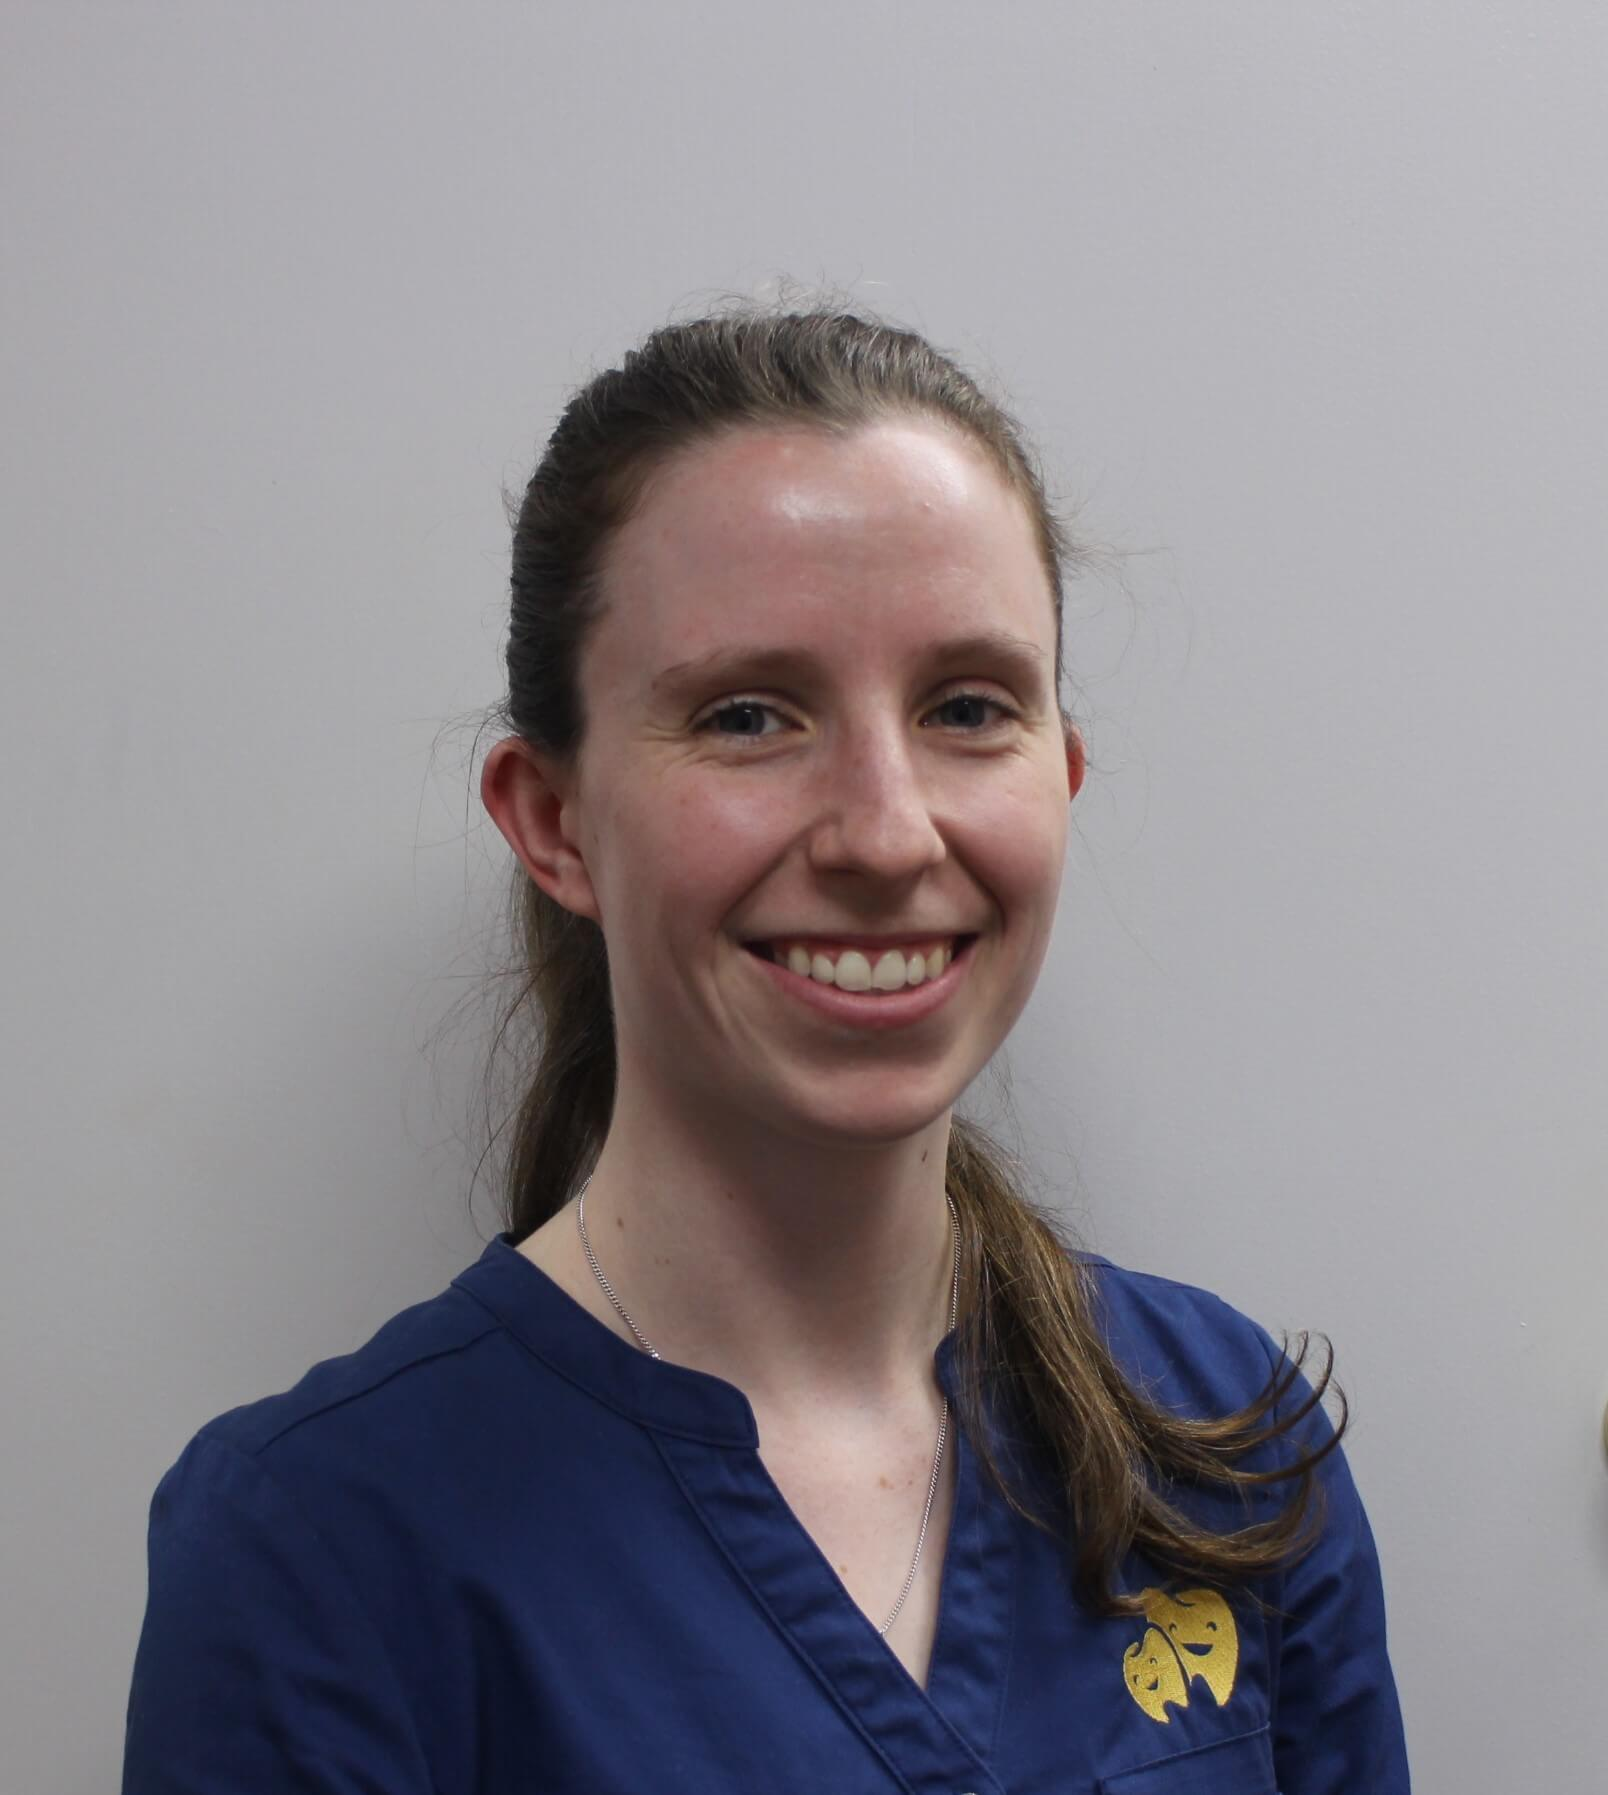 About Children's Dentistry Castle Hill Dental - Dr. Tegan Ryan